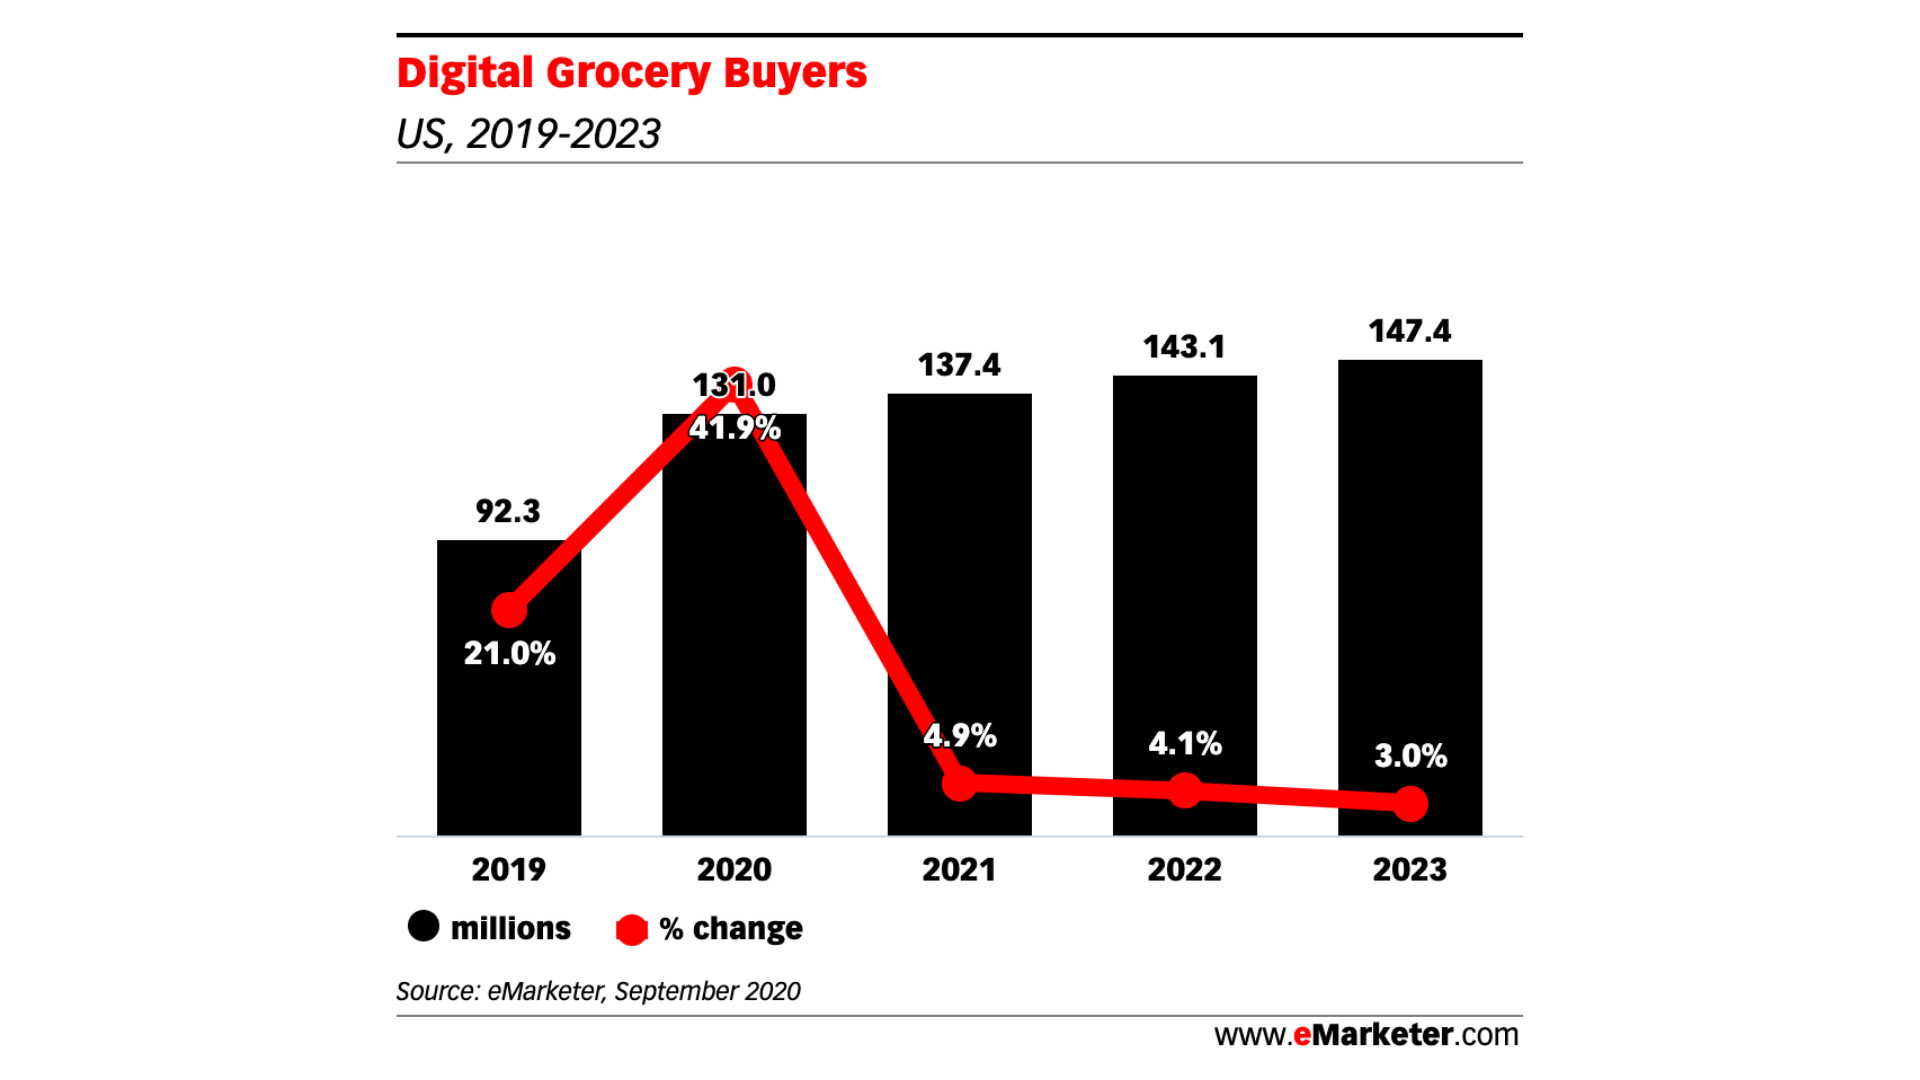 Digital Grocery Buyers